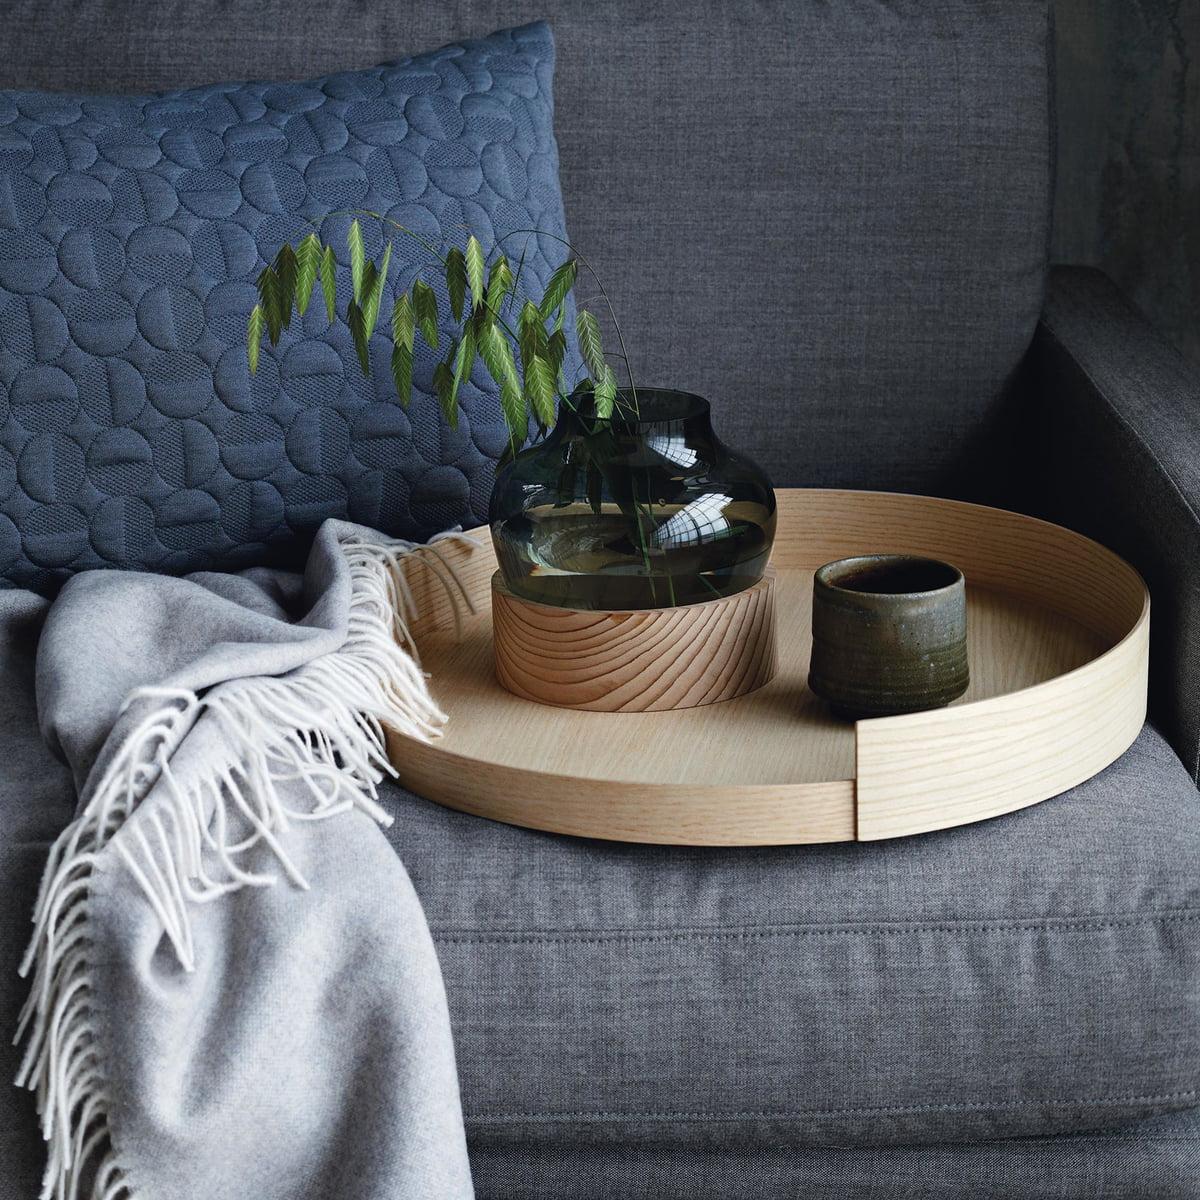 Vertigo cushion 50 x 50 cm by fritz hansen for Sofa 50 cm sitzhohe